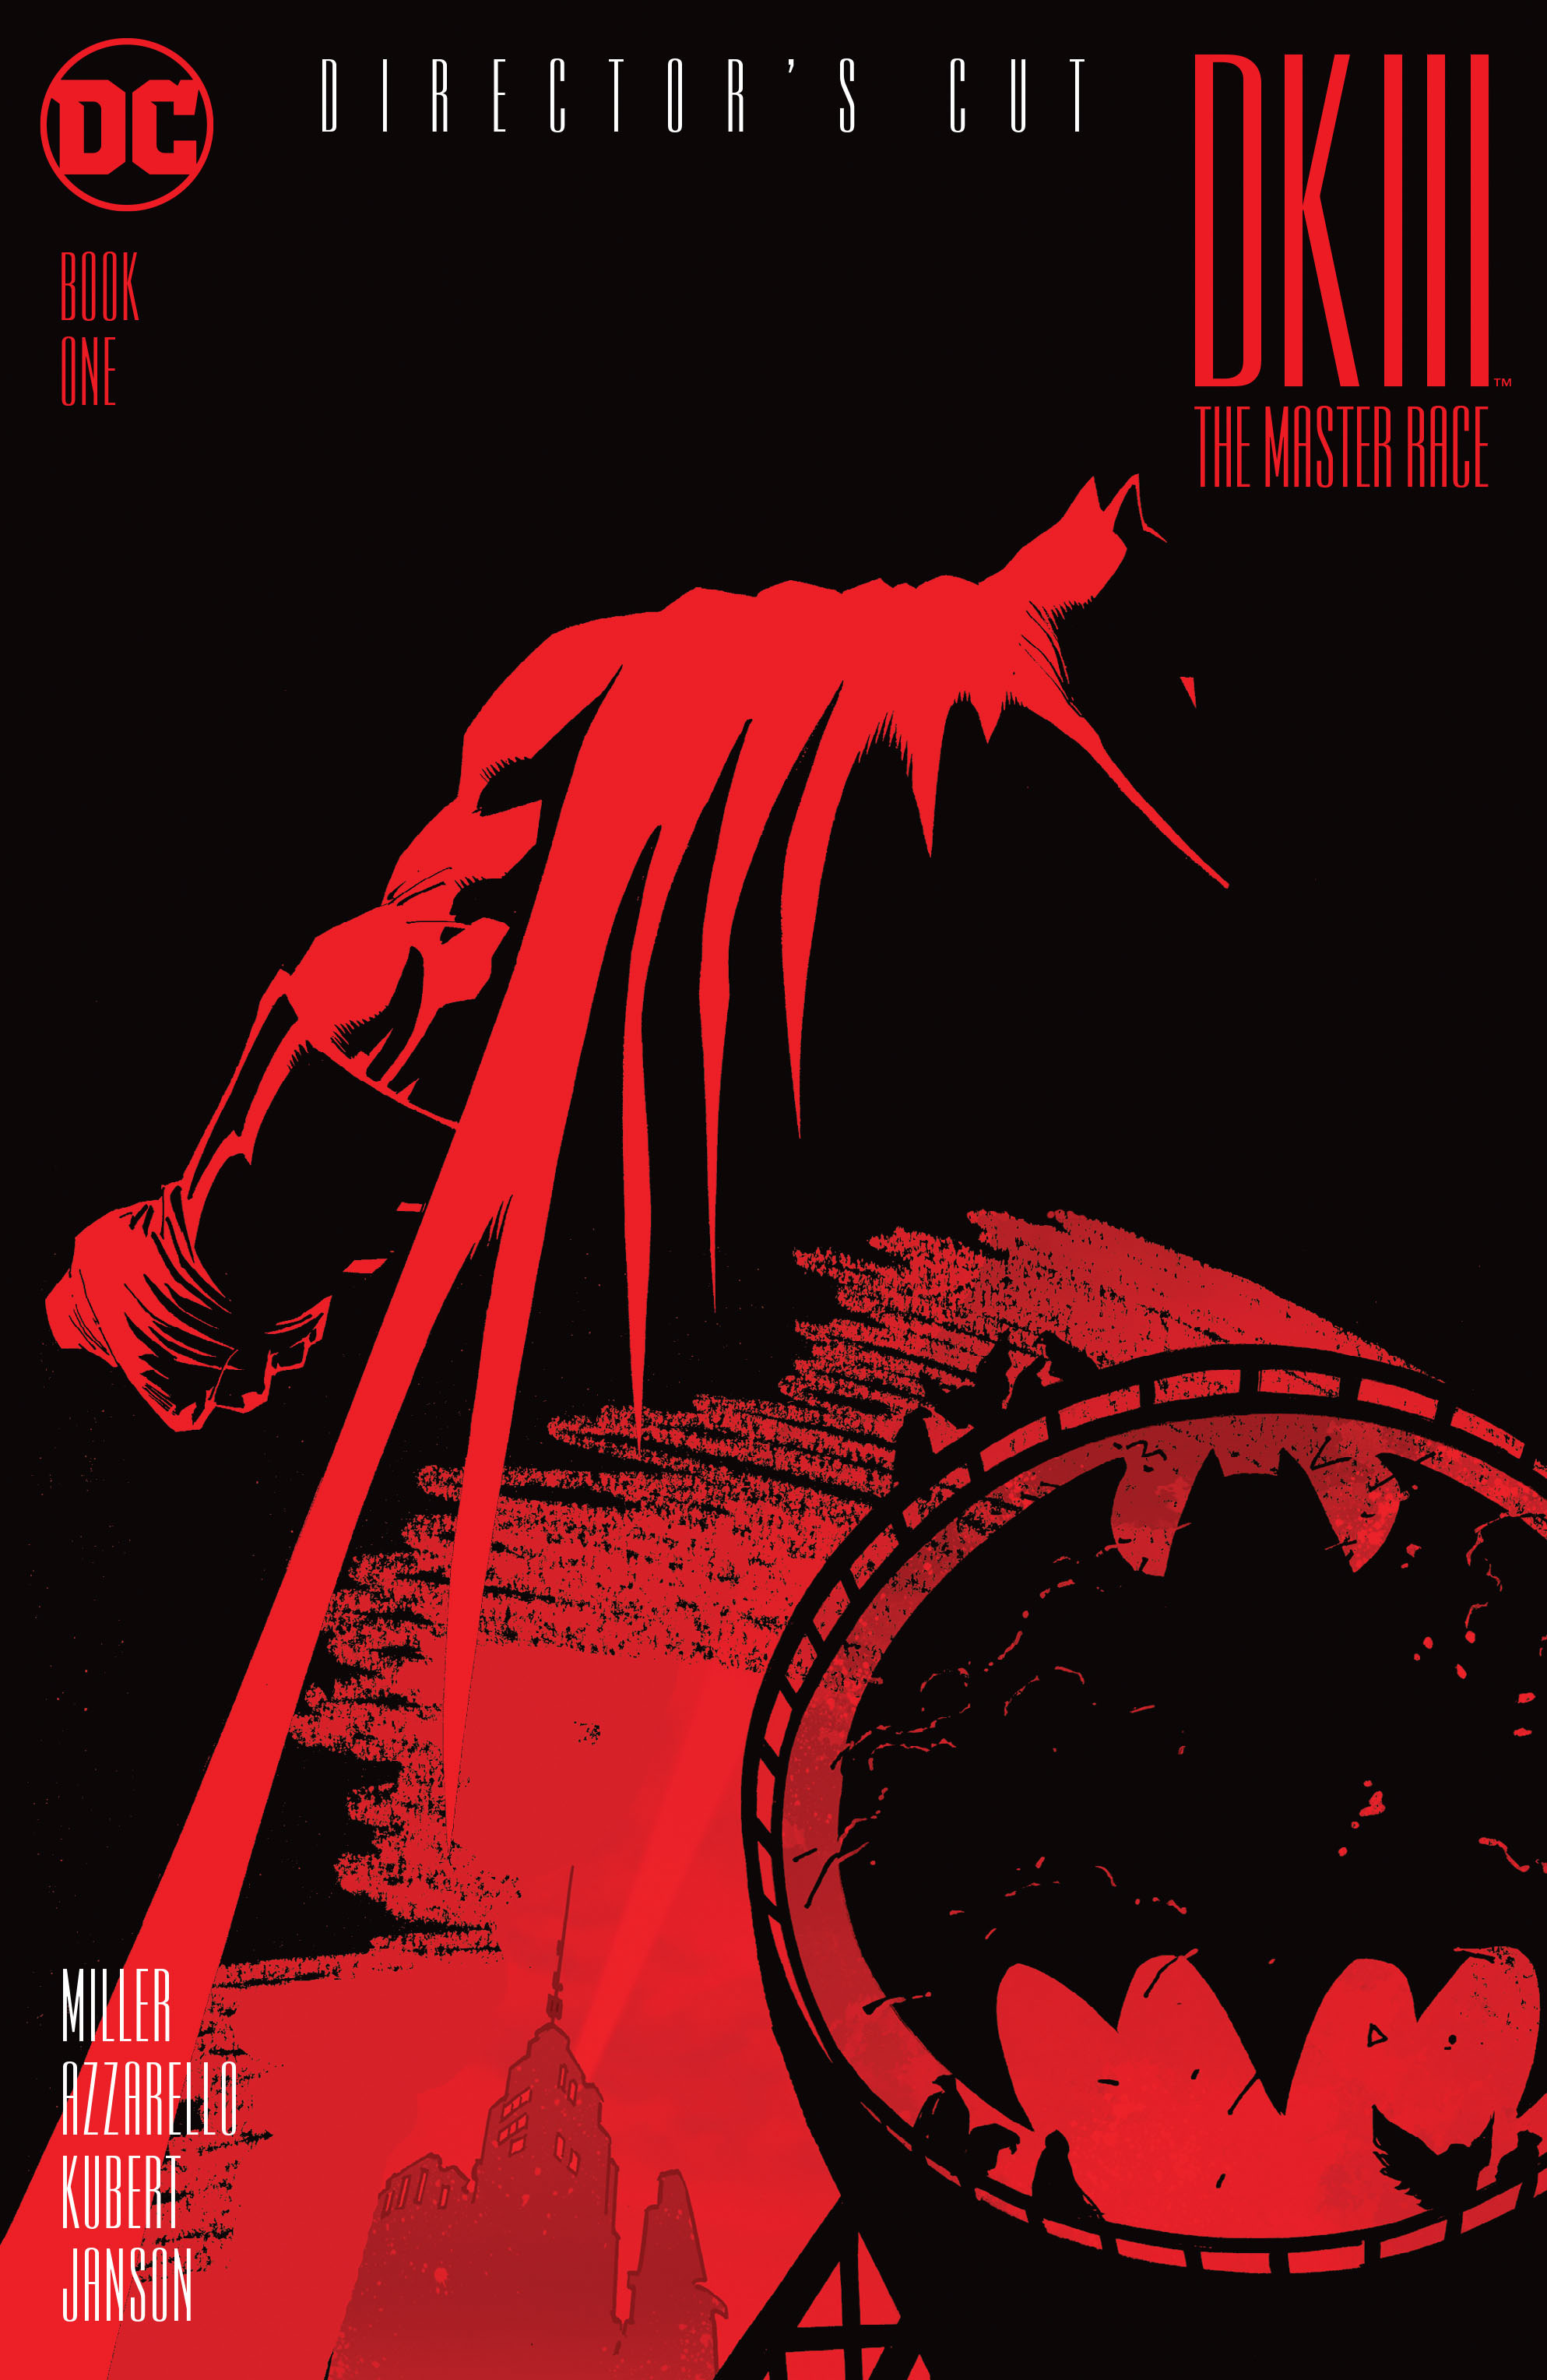 Dark Knight III: The Master Race Directors Cut Full Page 1